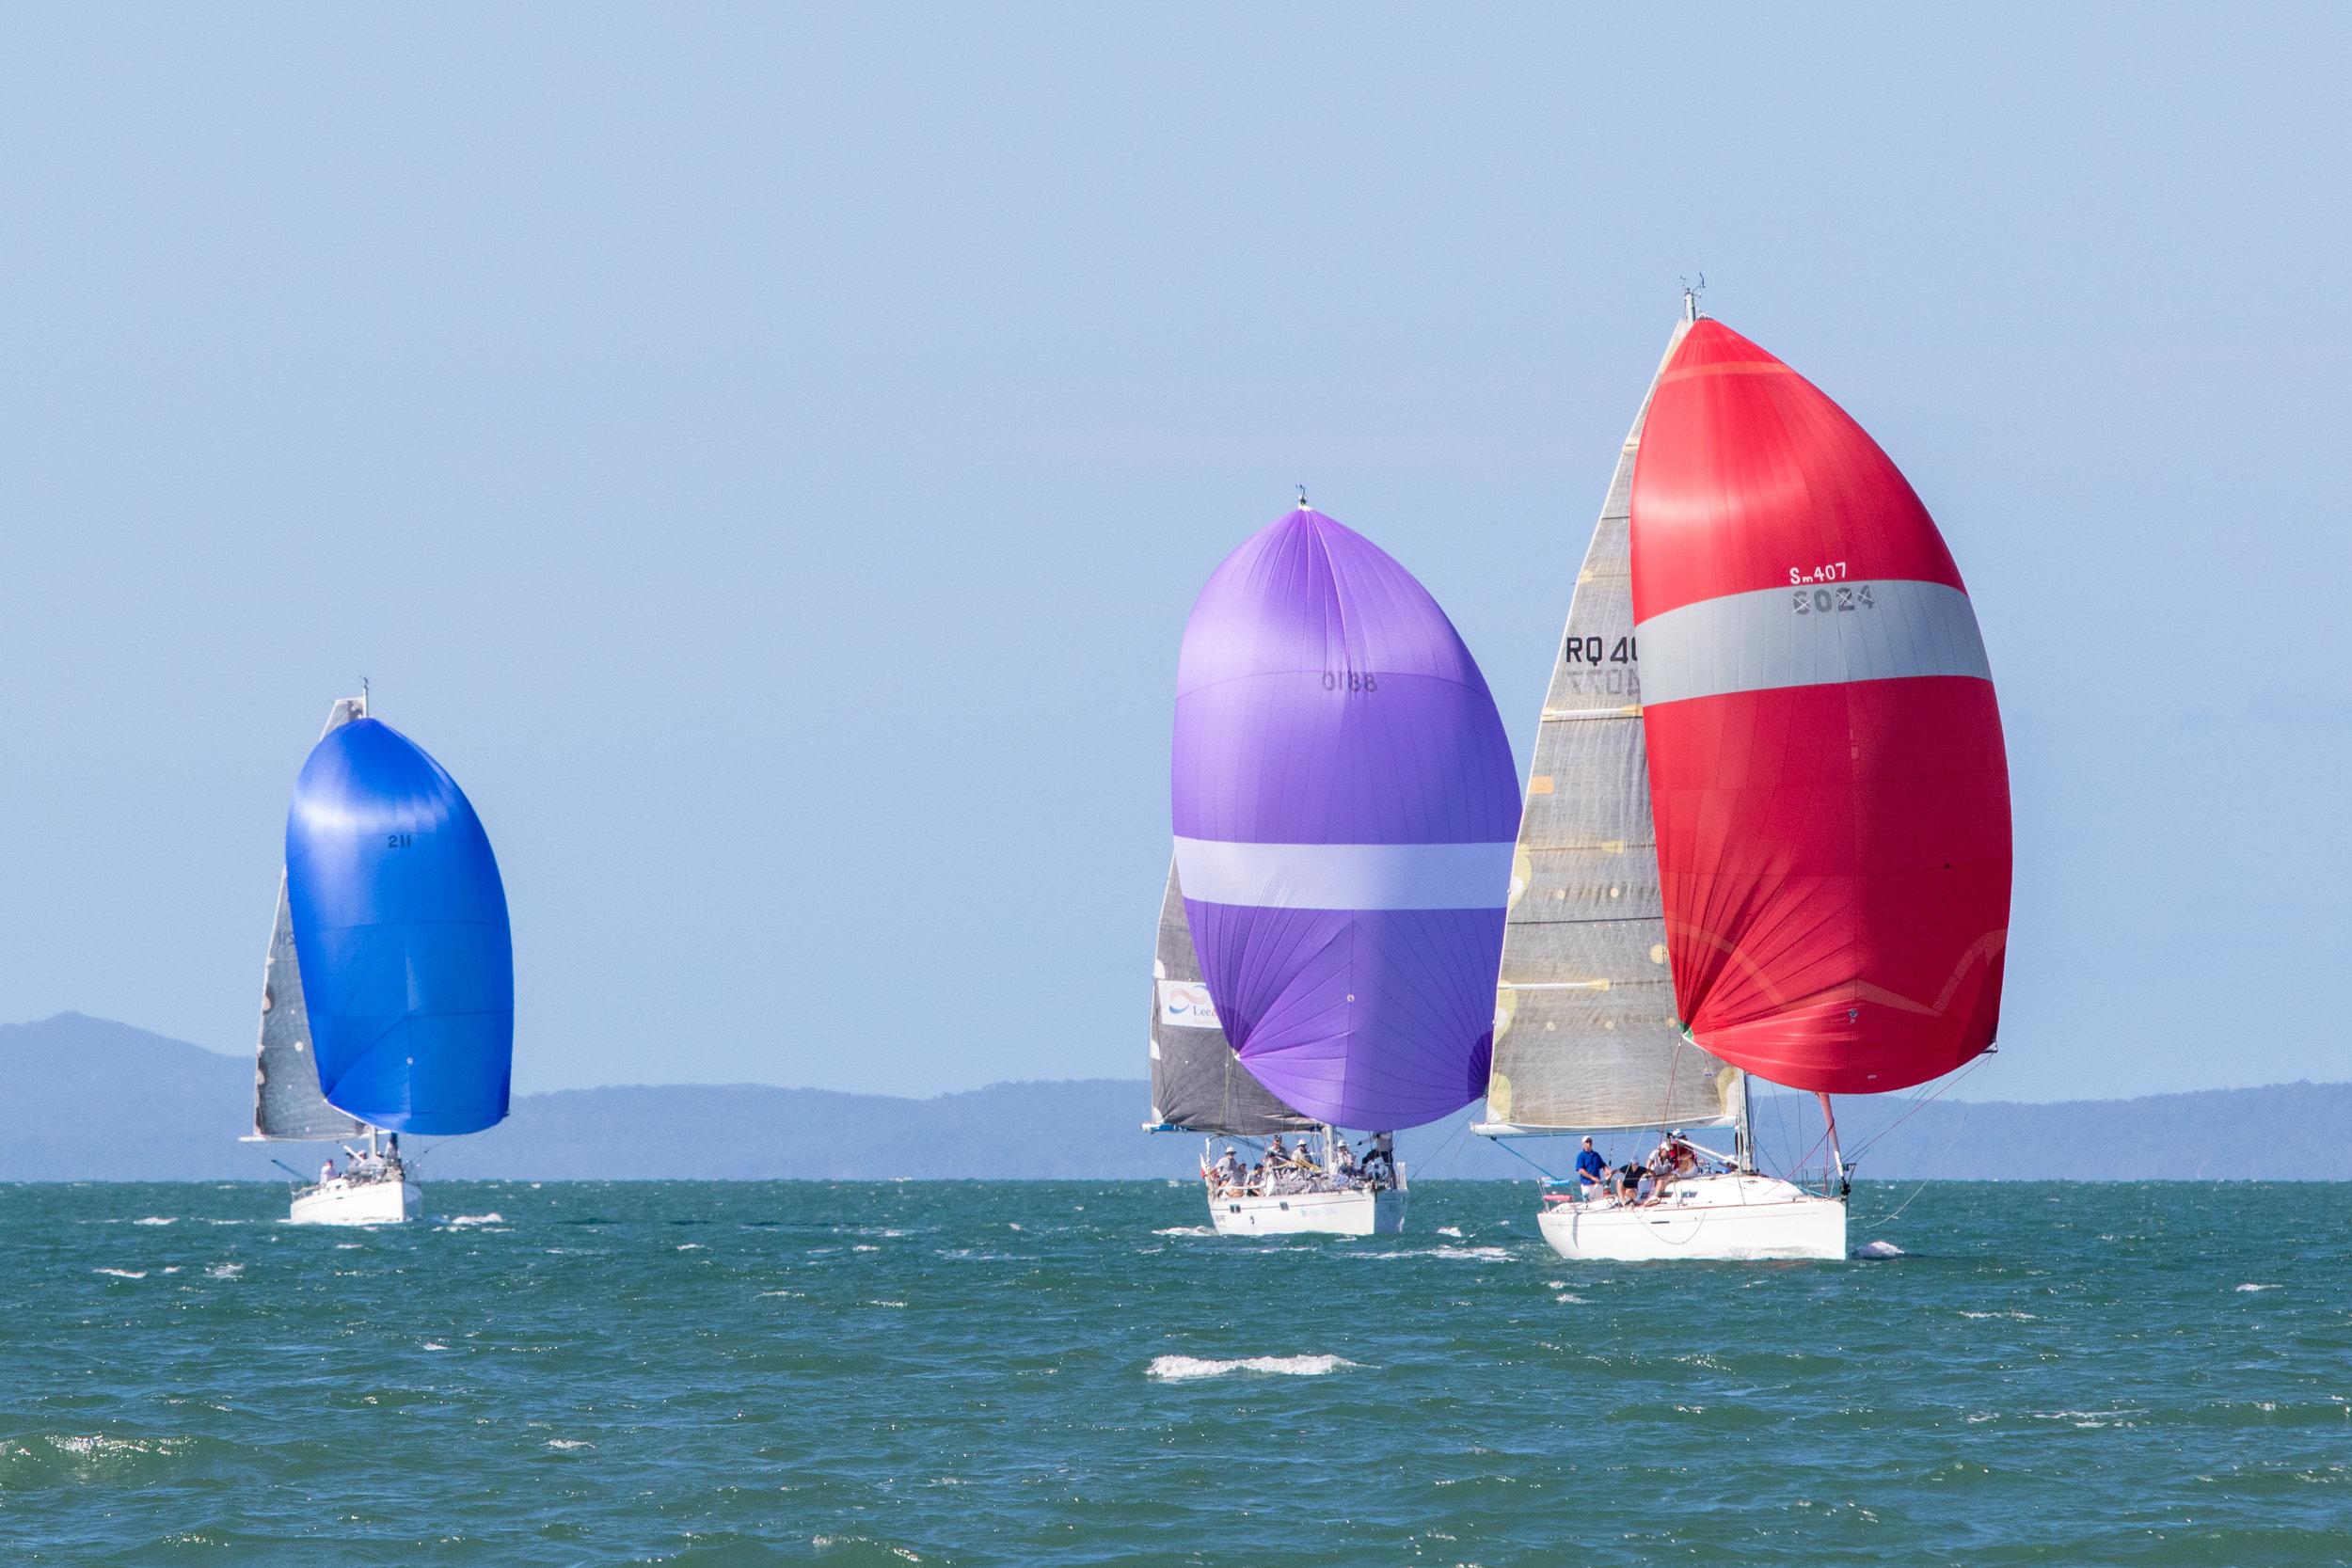 Hamilton Island Race Week 2016 - Boat Gold Coast